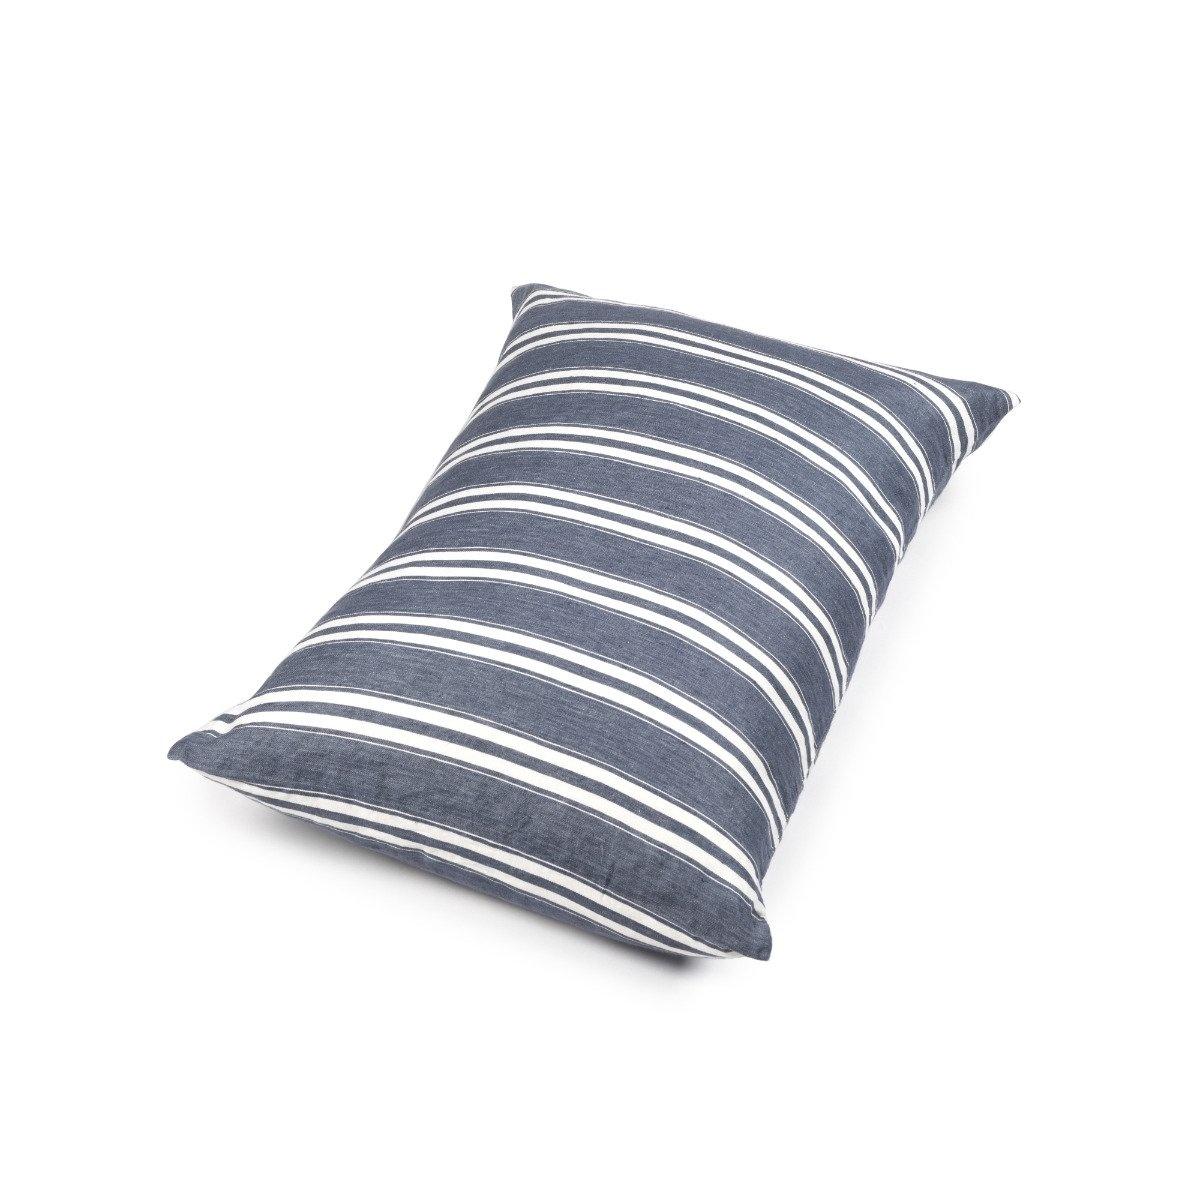 Pillowcase - Folkestone-2